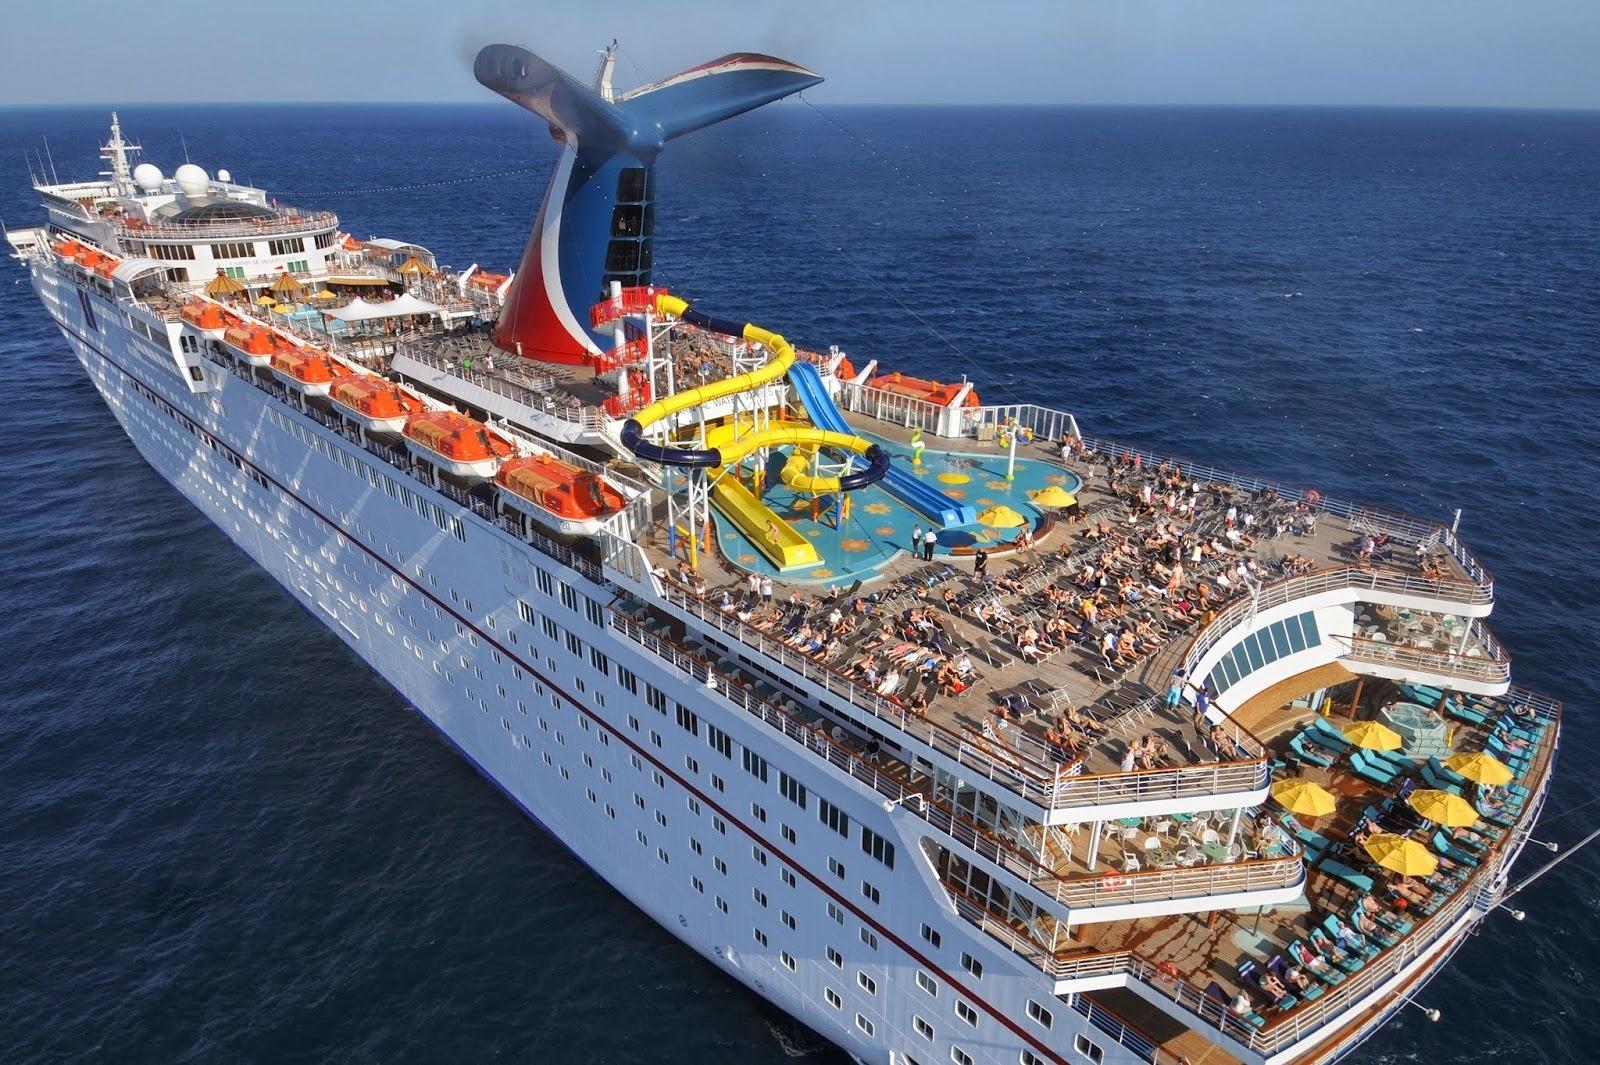 49+] Cruise Countdown Wallpaper On Wallpapersafari_Countdown Calendar For Cruise